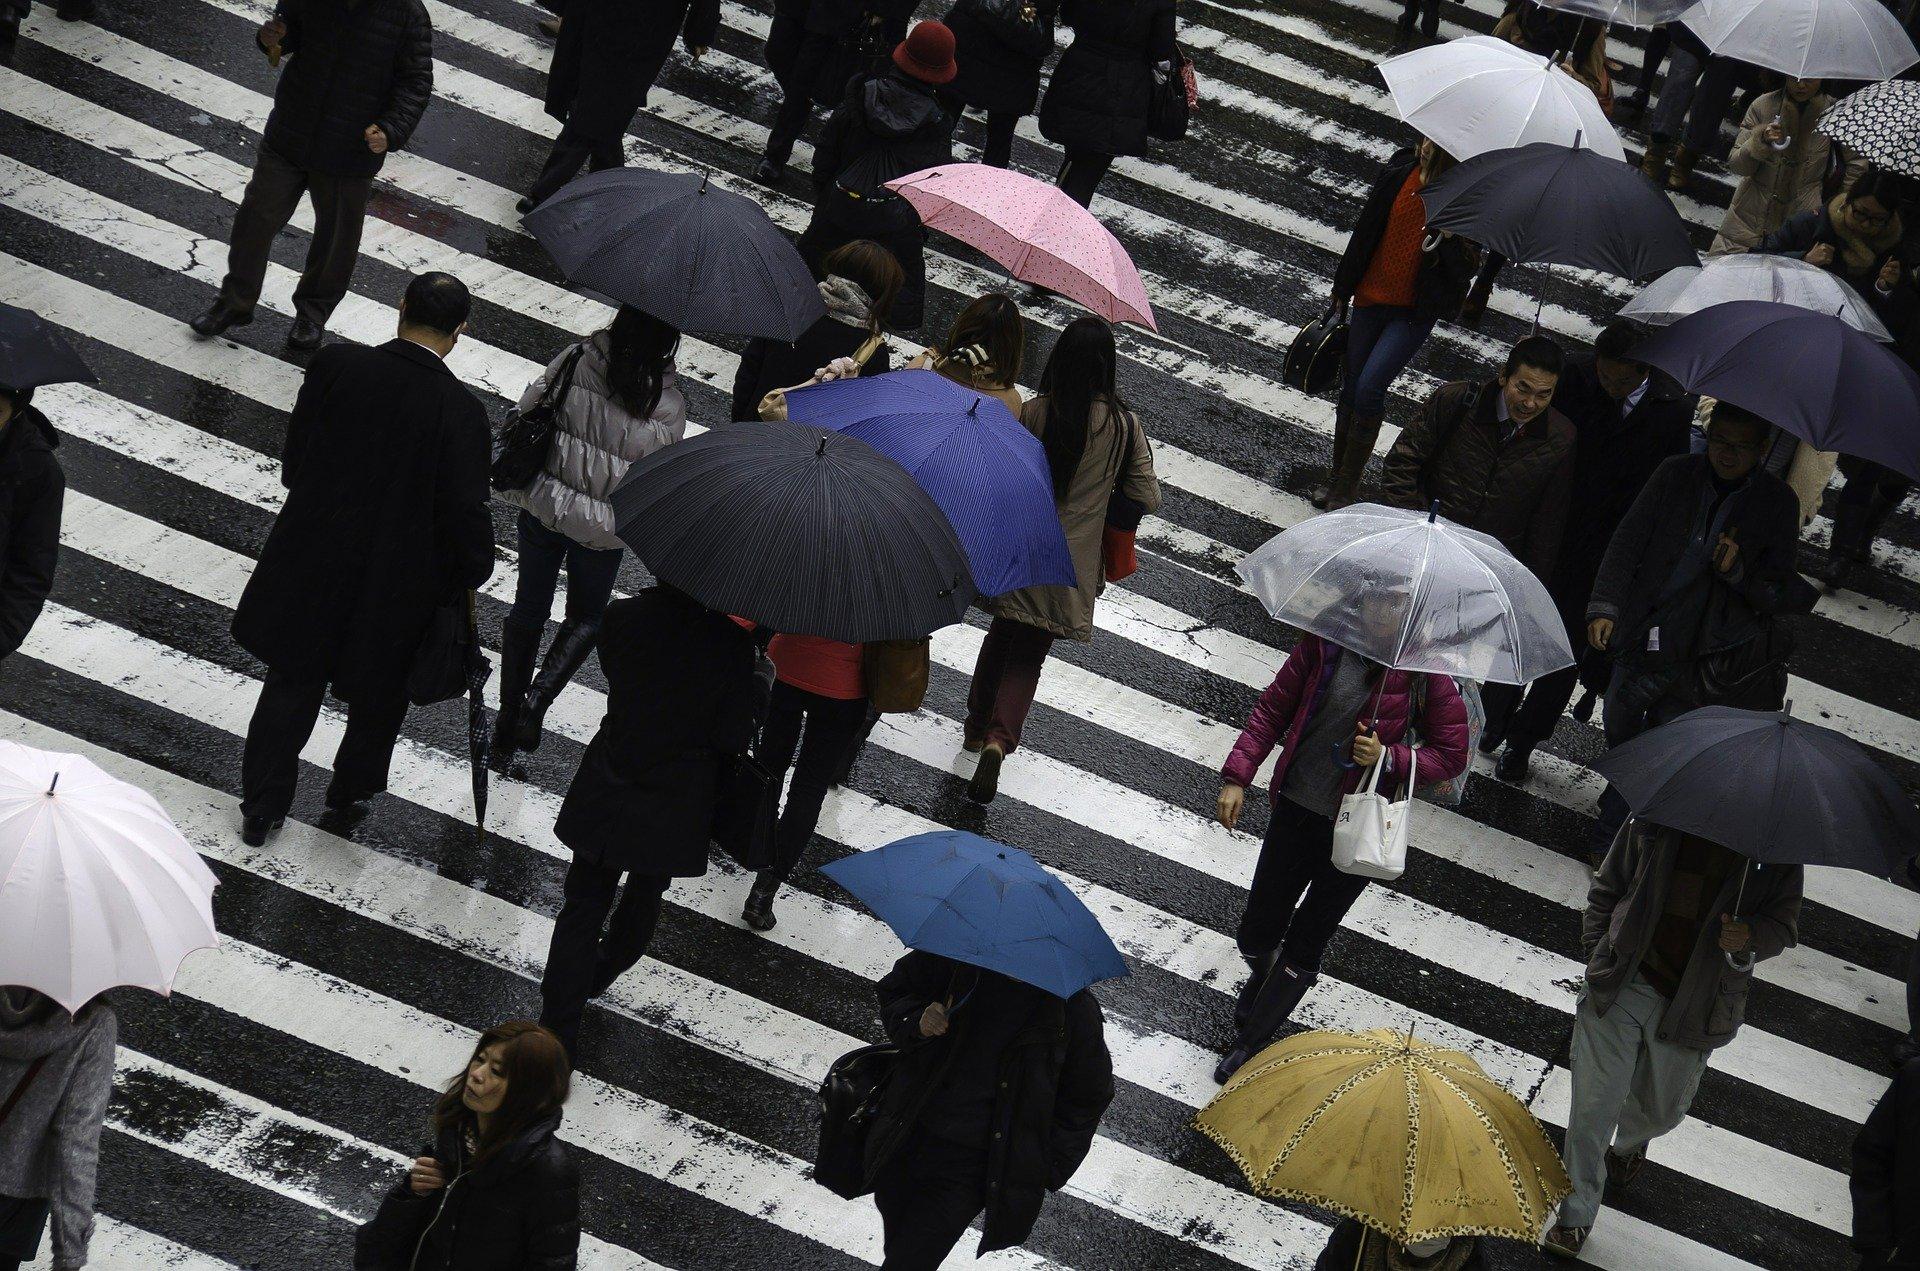 shibuya traveltherapists Il mio viaggio in Giappone traveltherapists miglior blog di viaggio